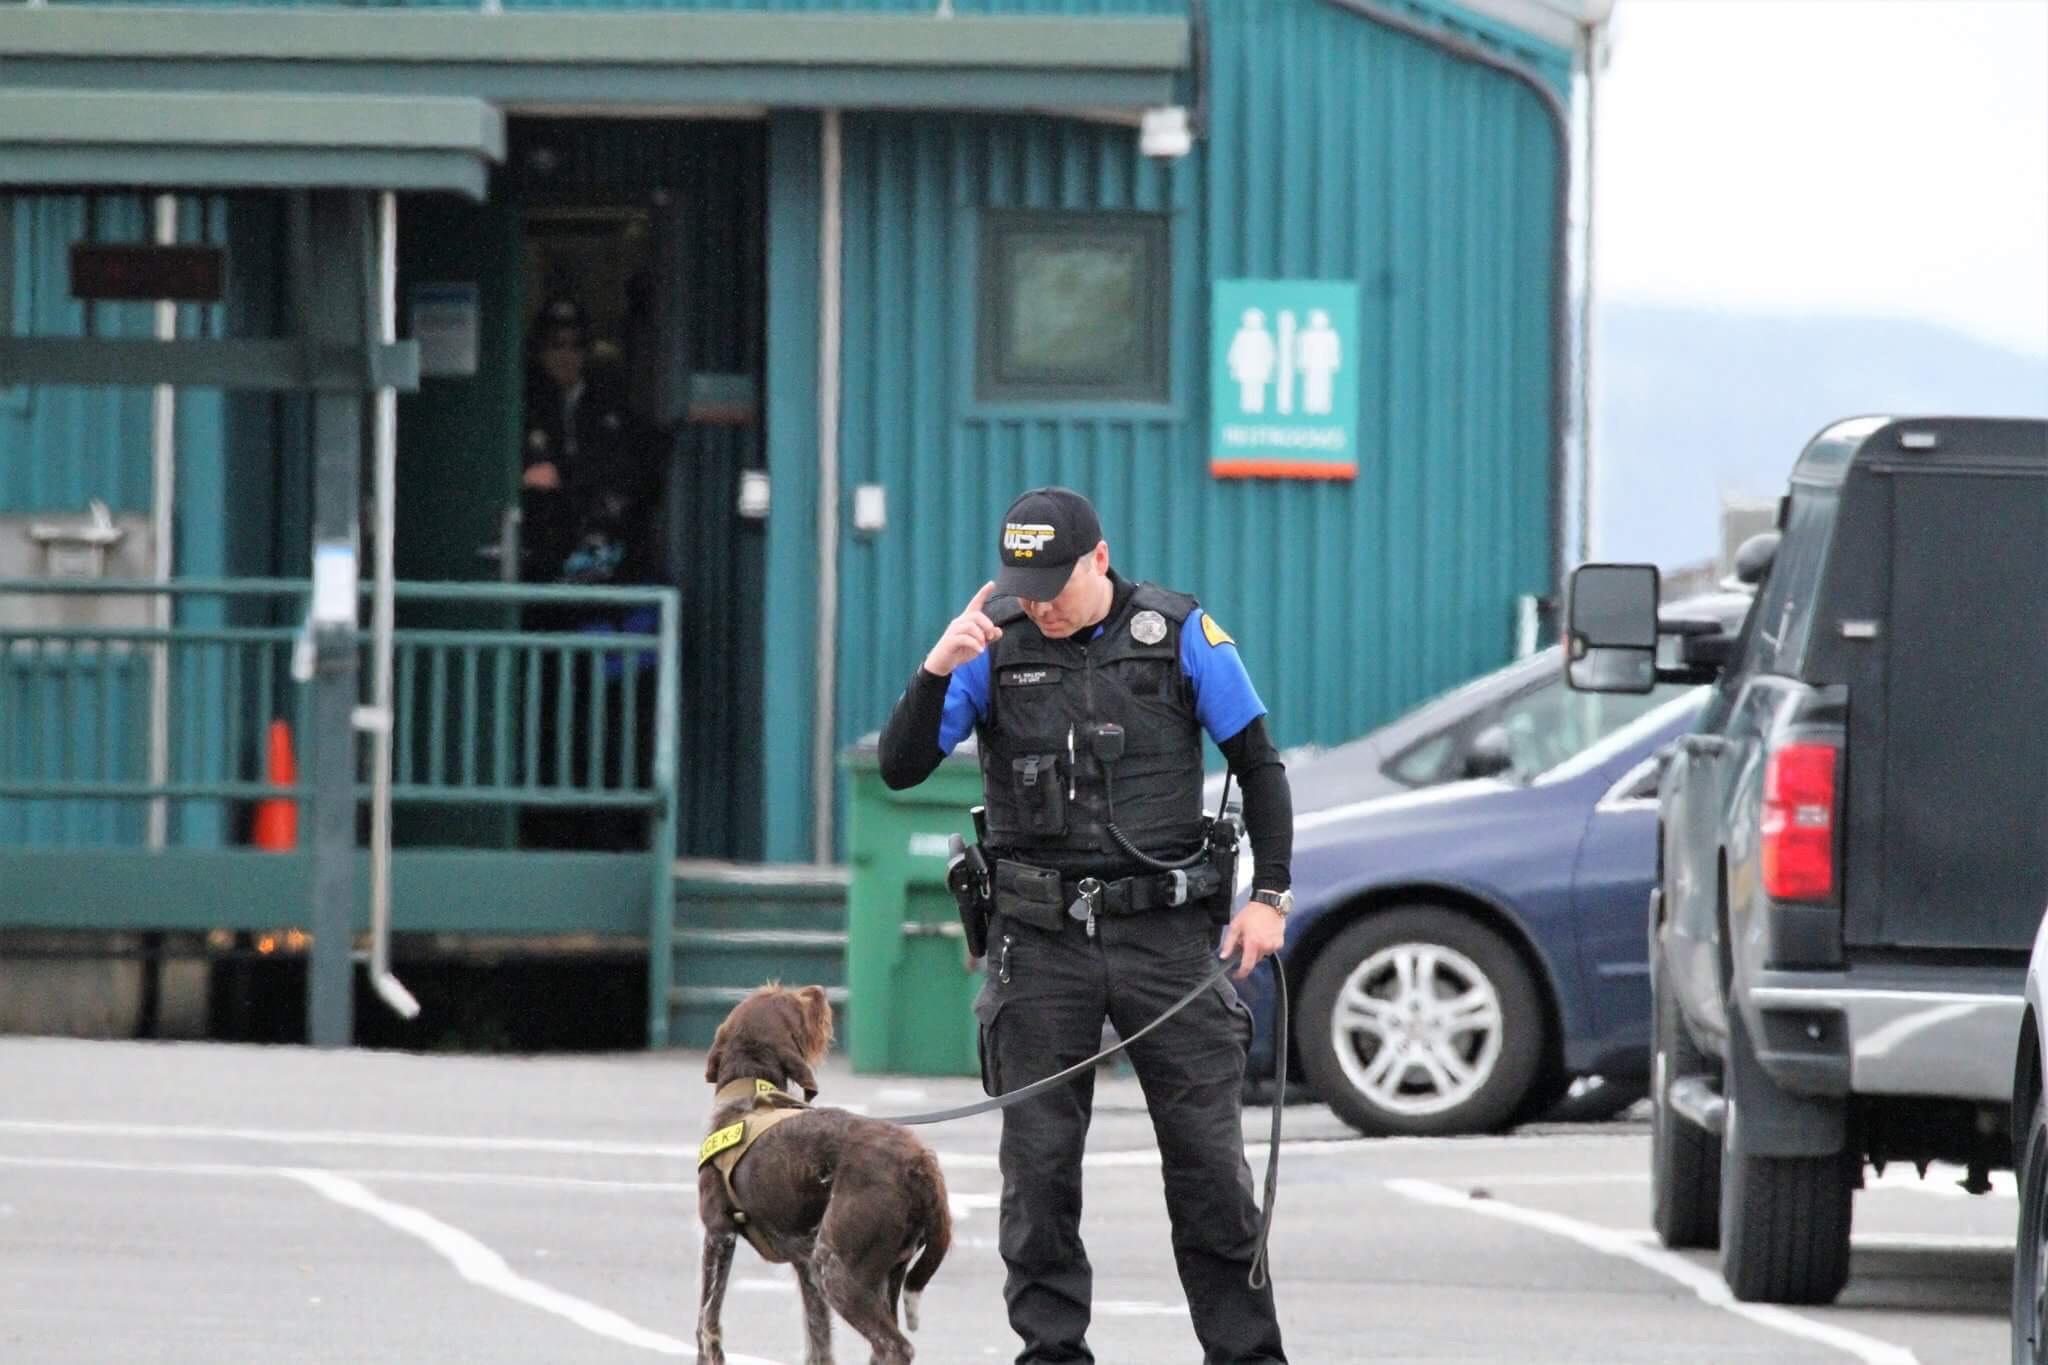 Update: Edmonds ferry service restored after closure due to suspicious package - My Edmonds News